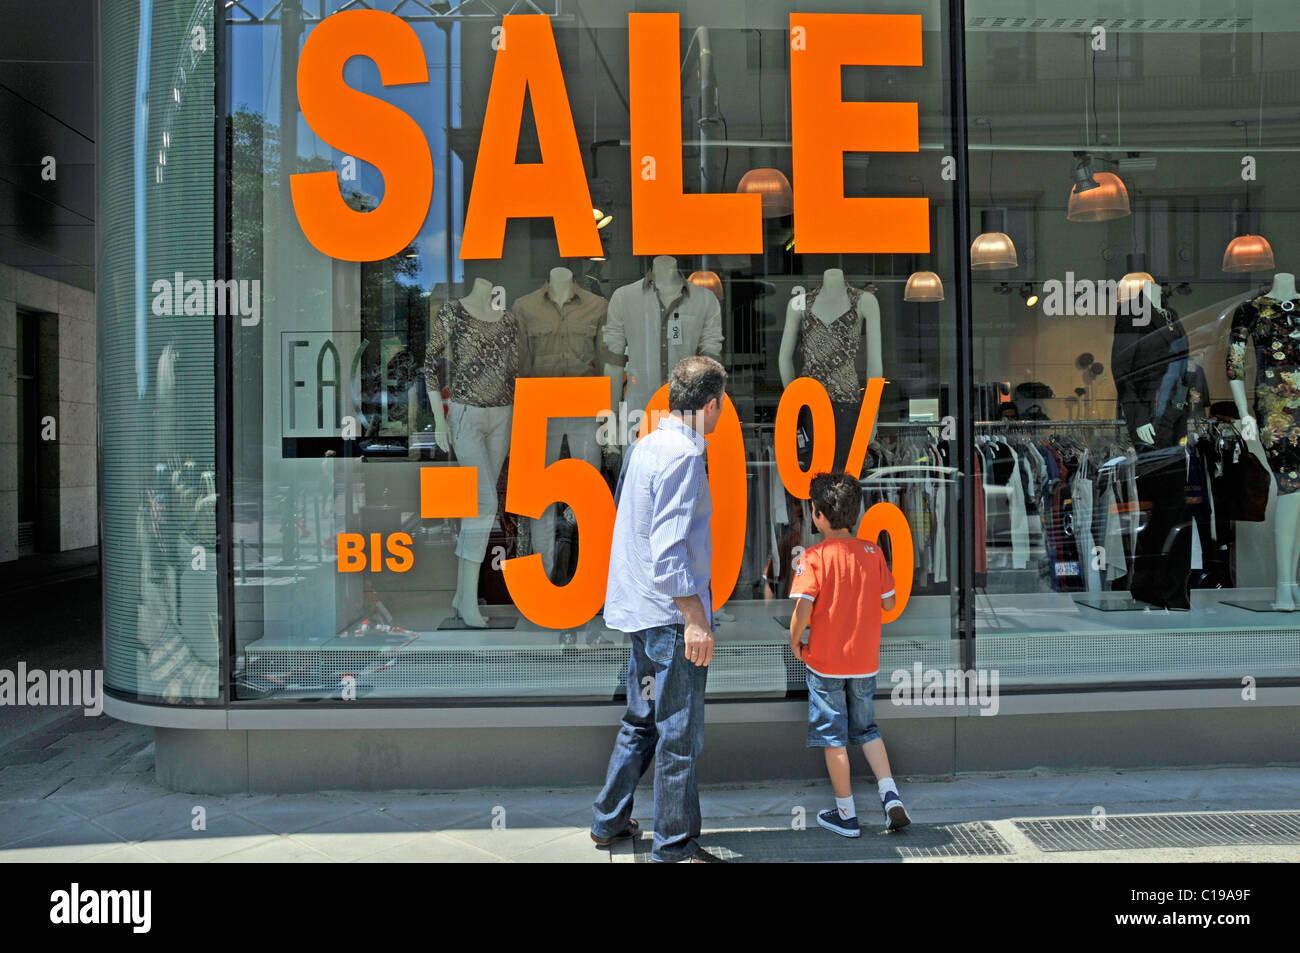 Sale sign on clothing shop window display, Frankfurt, Hesse, Germany, Europe - Stock Image